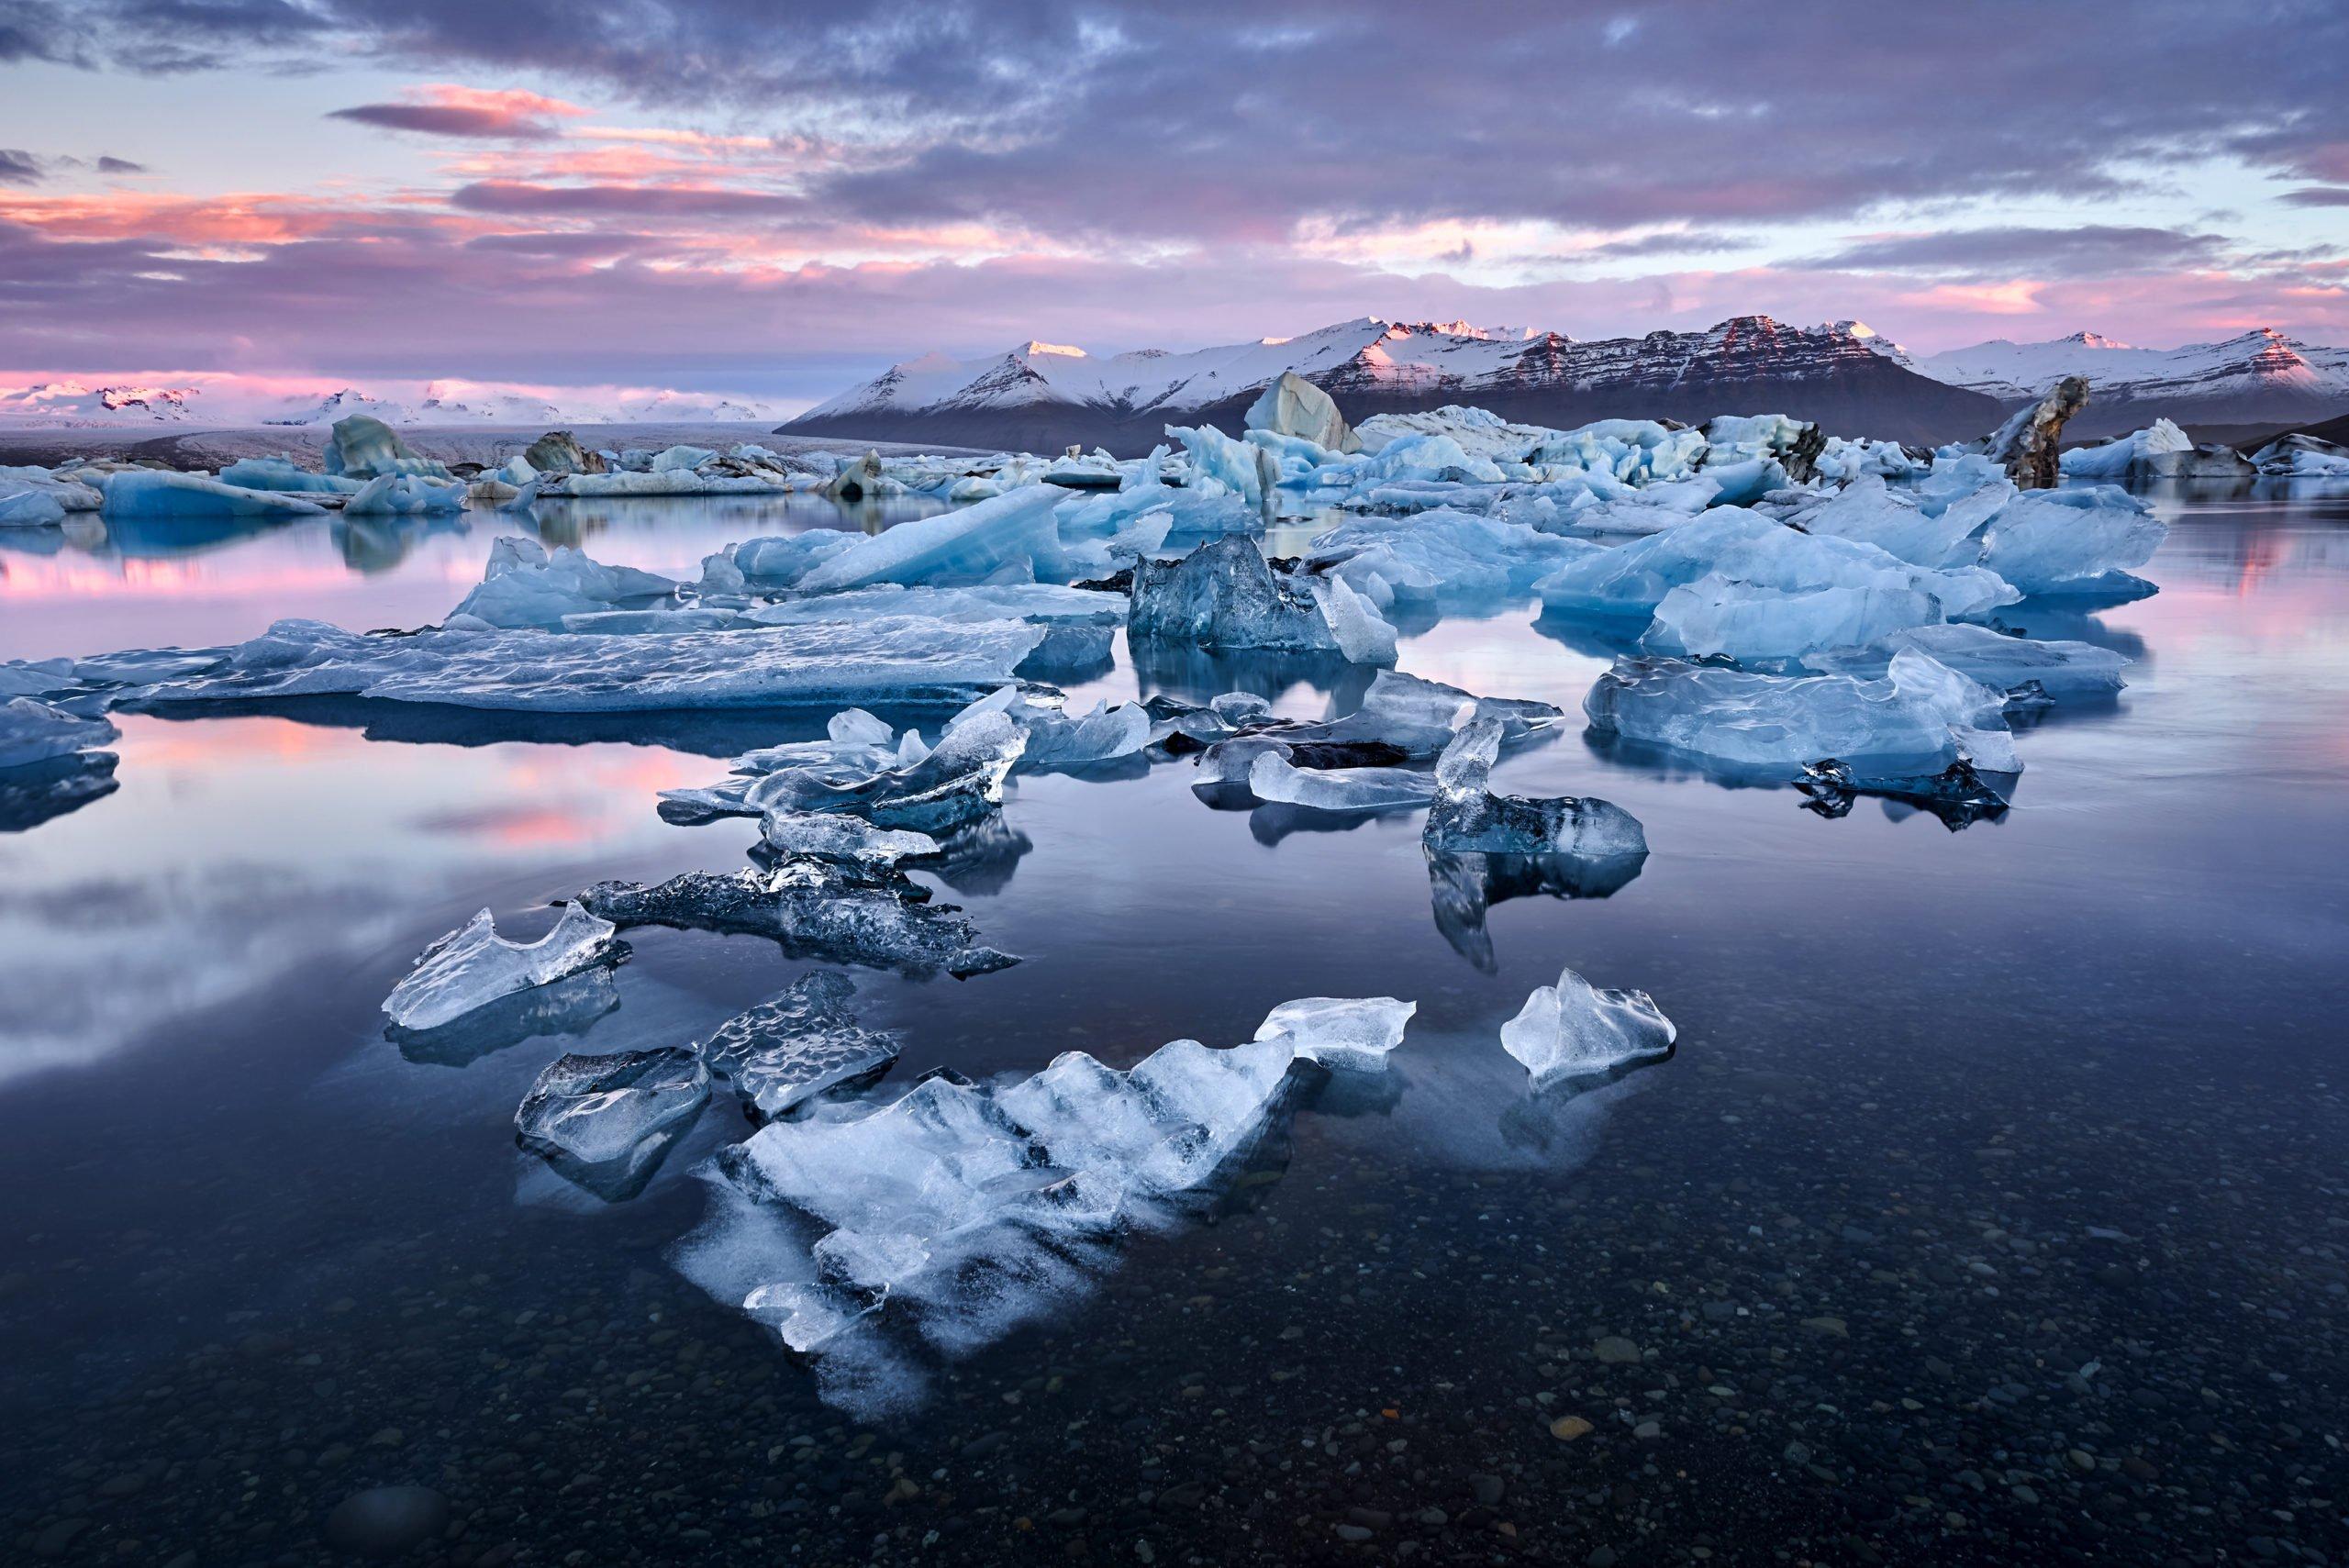 Discover The Biggest Glacier Lagoon Icelands On Your Jökulsárlón Glacier Lagoon Tour